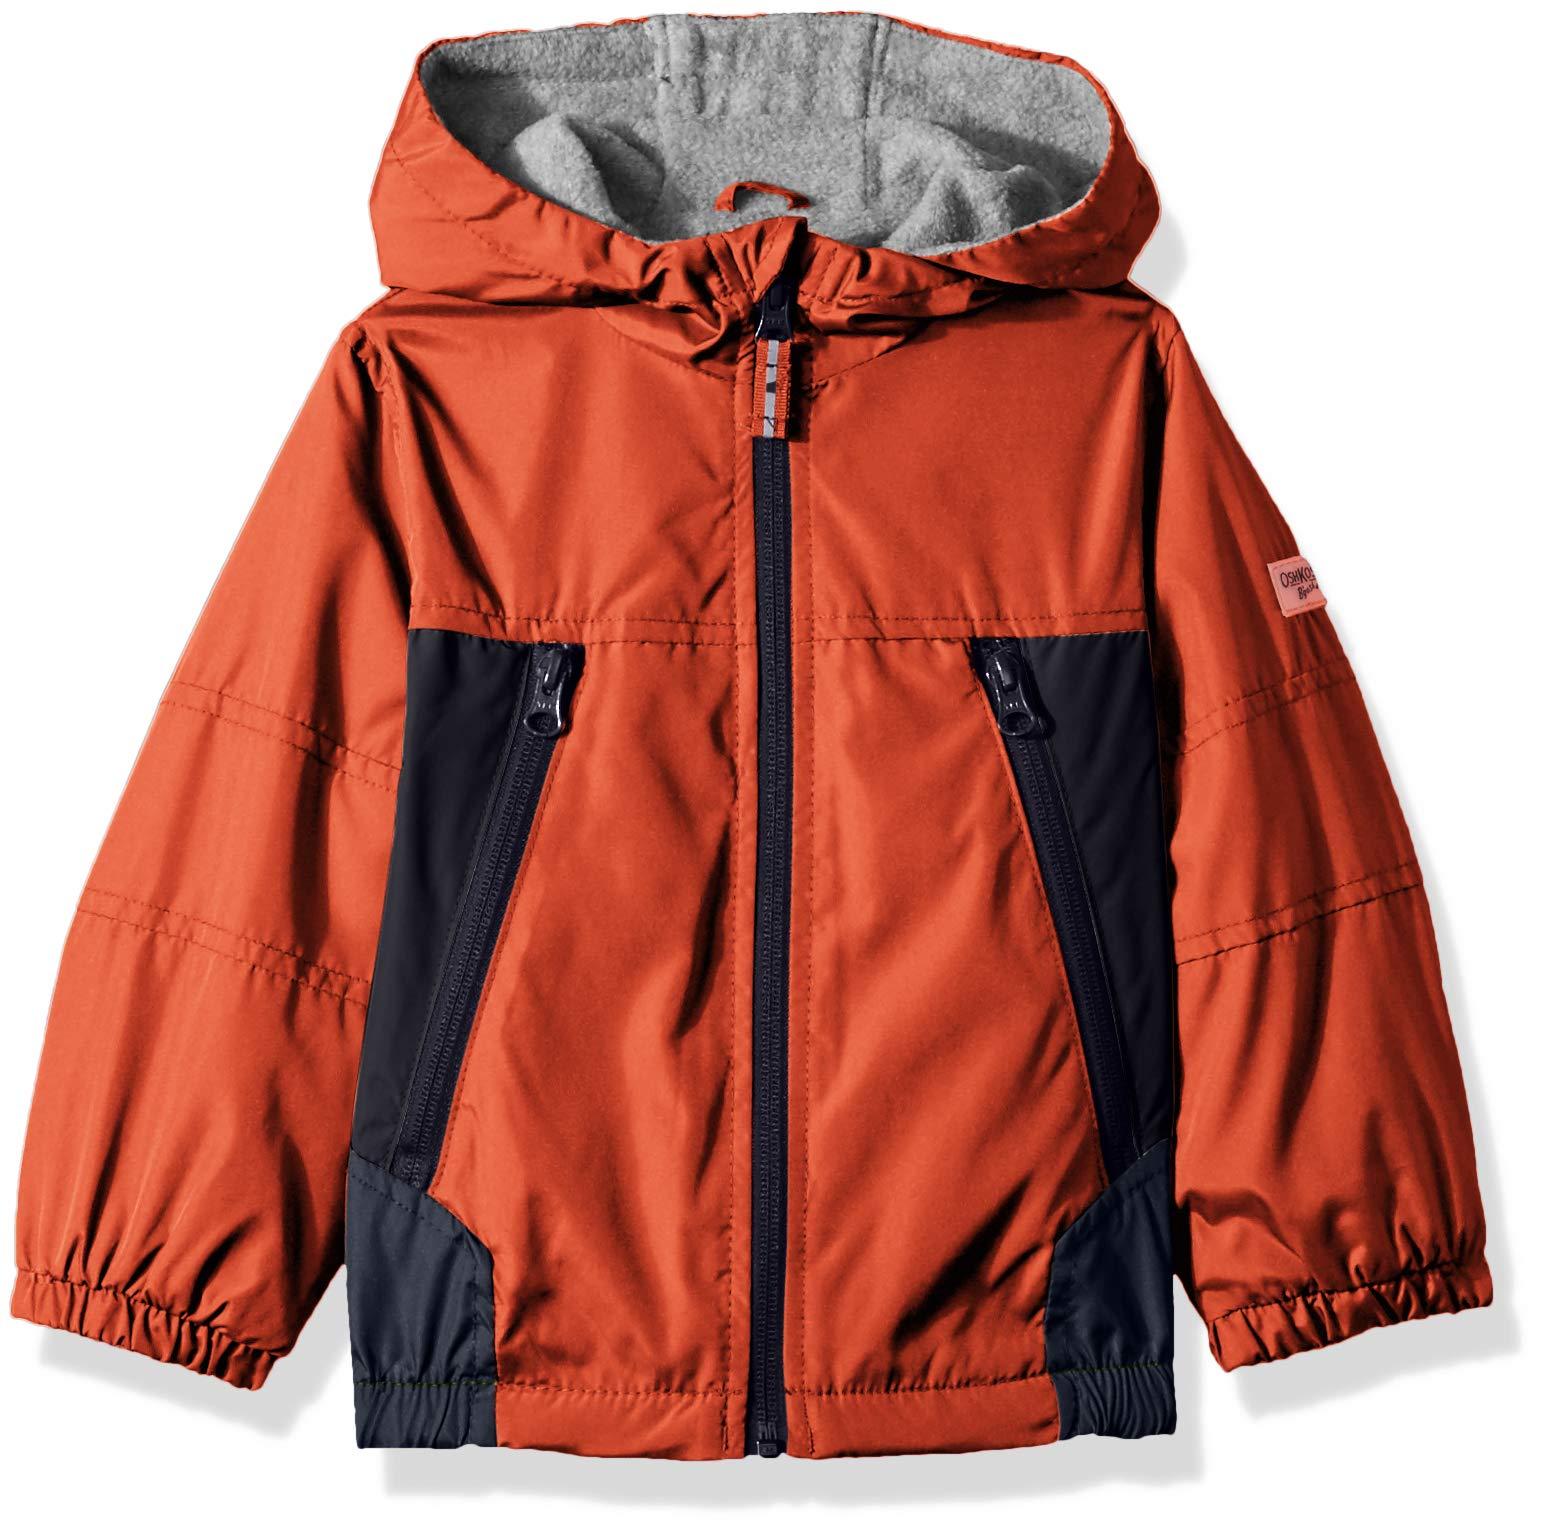 Osh Kosh Boys' Toddler Midweight Jacket, Edgy Orange/Navy/Grey, 2T